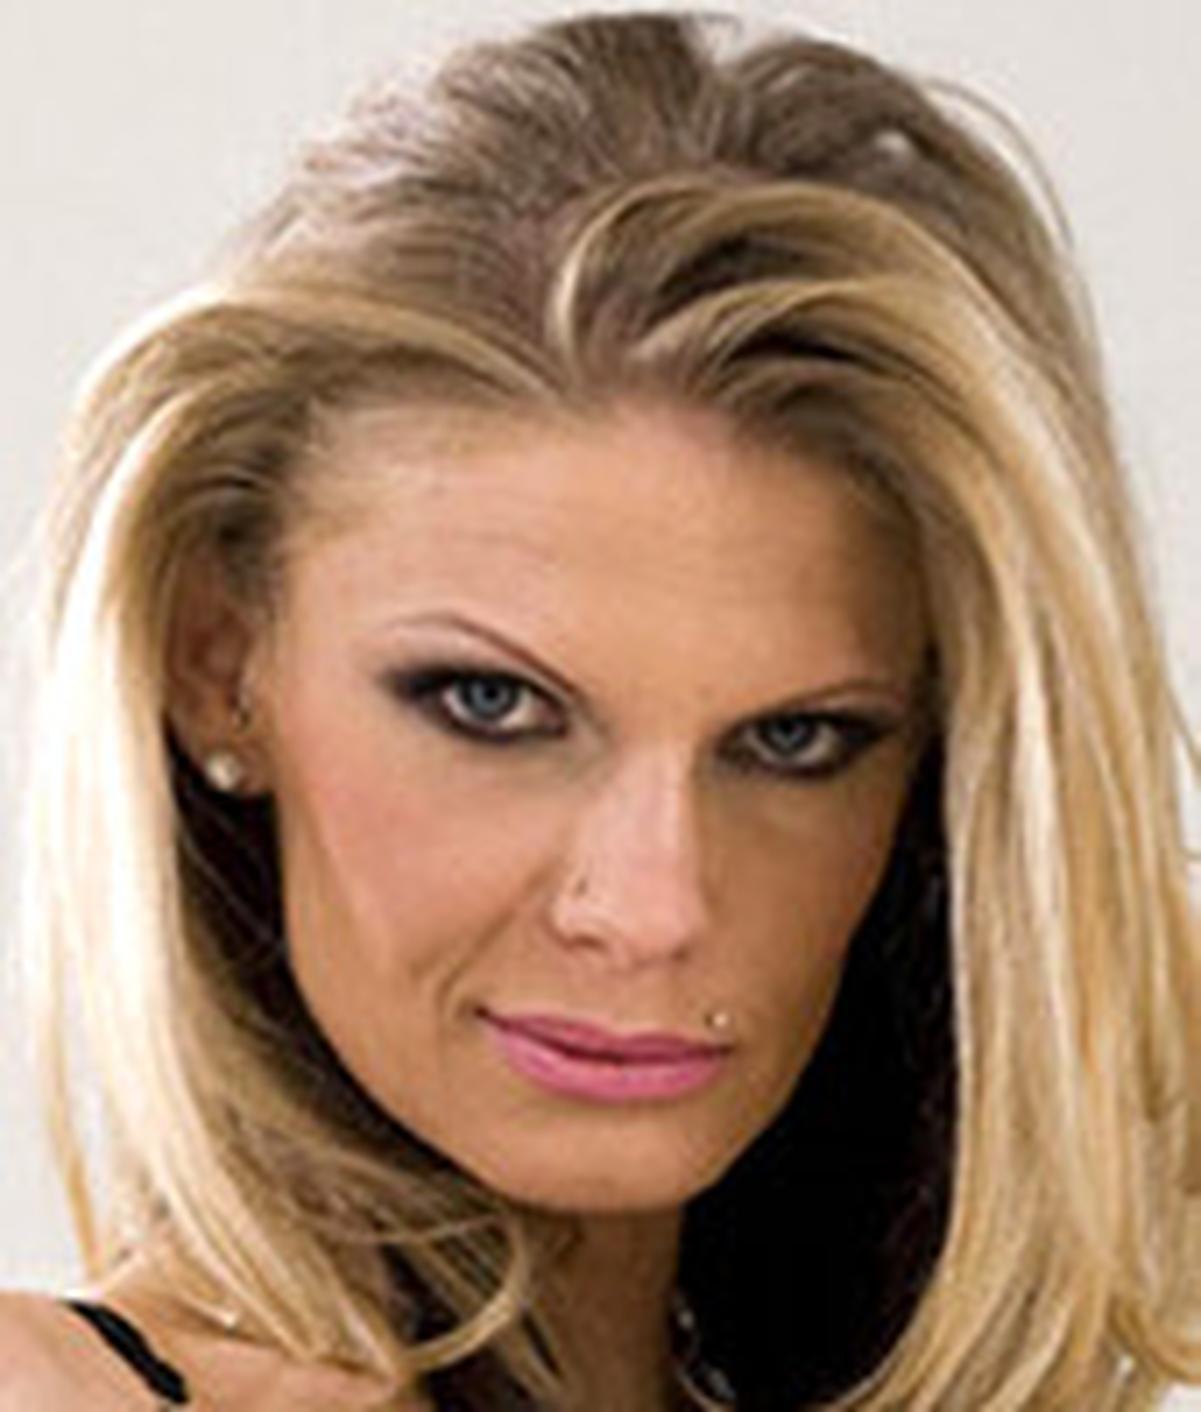 Lulu Lüstern Wiki & Bio - Pornographic Actress